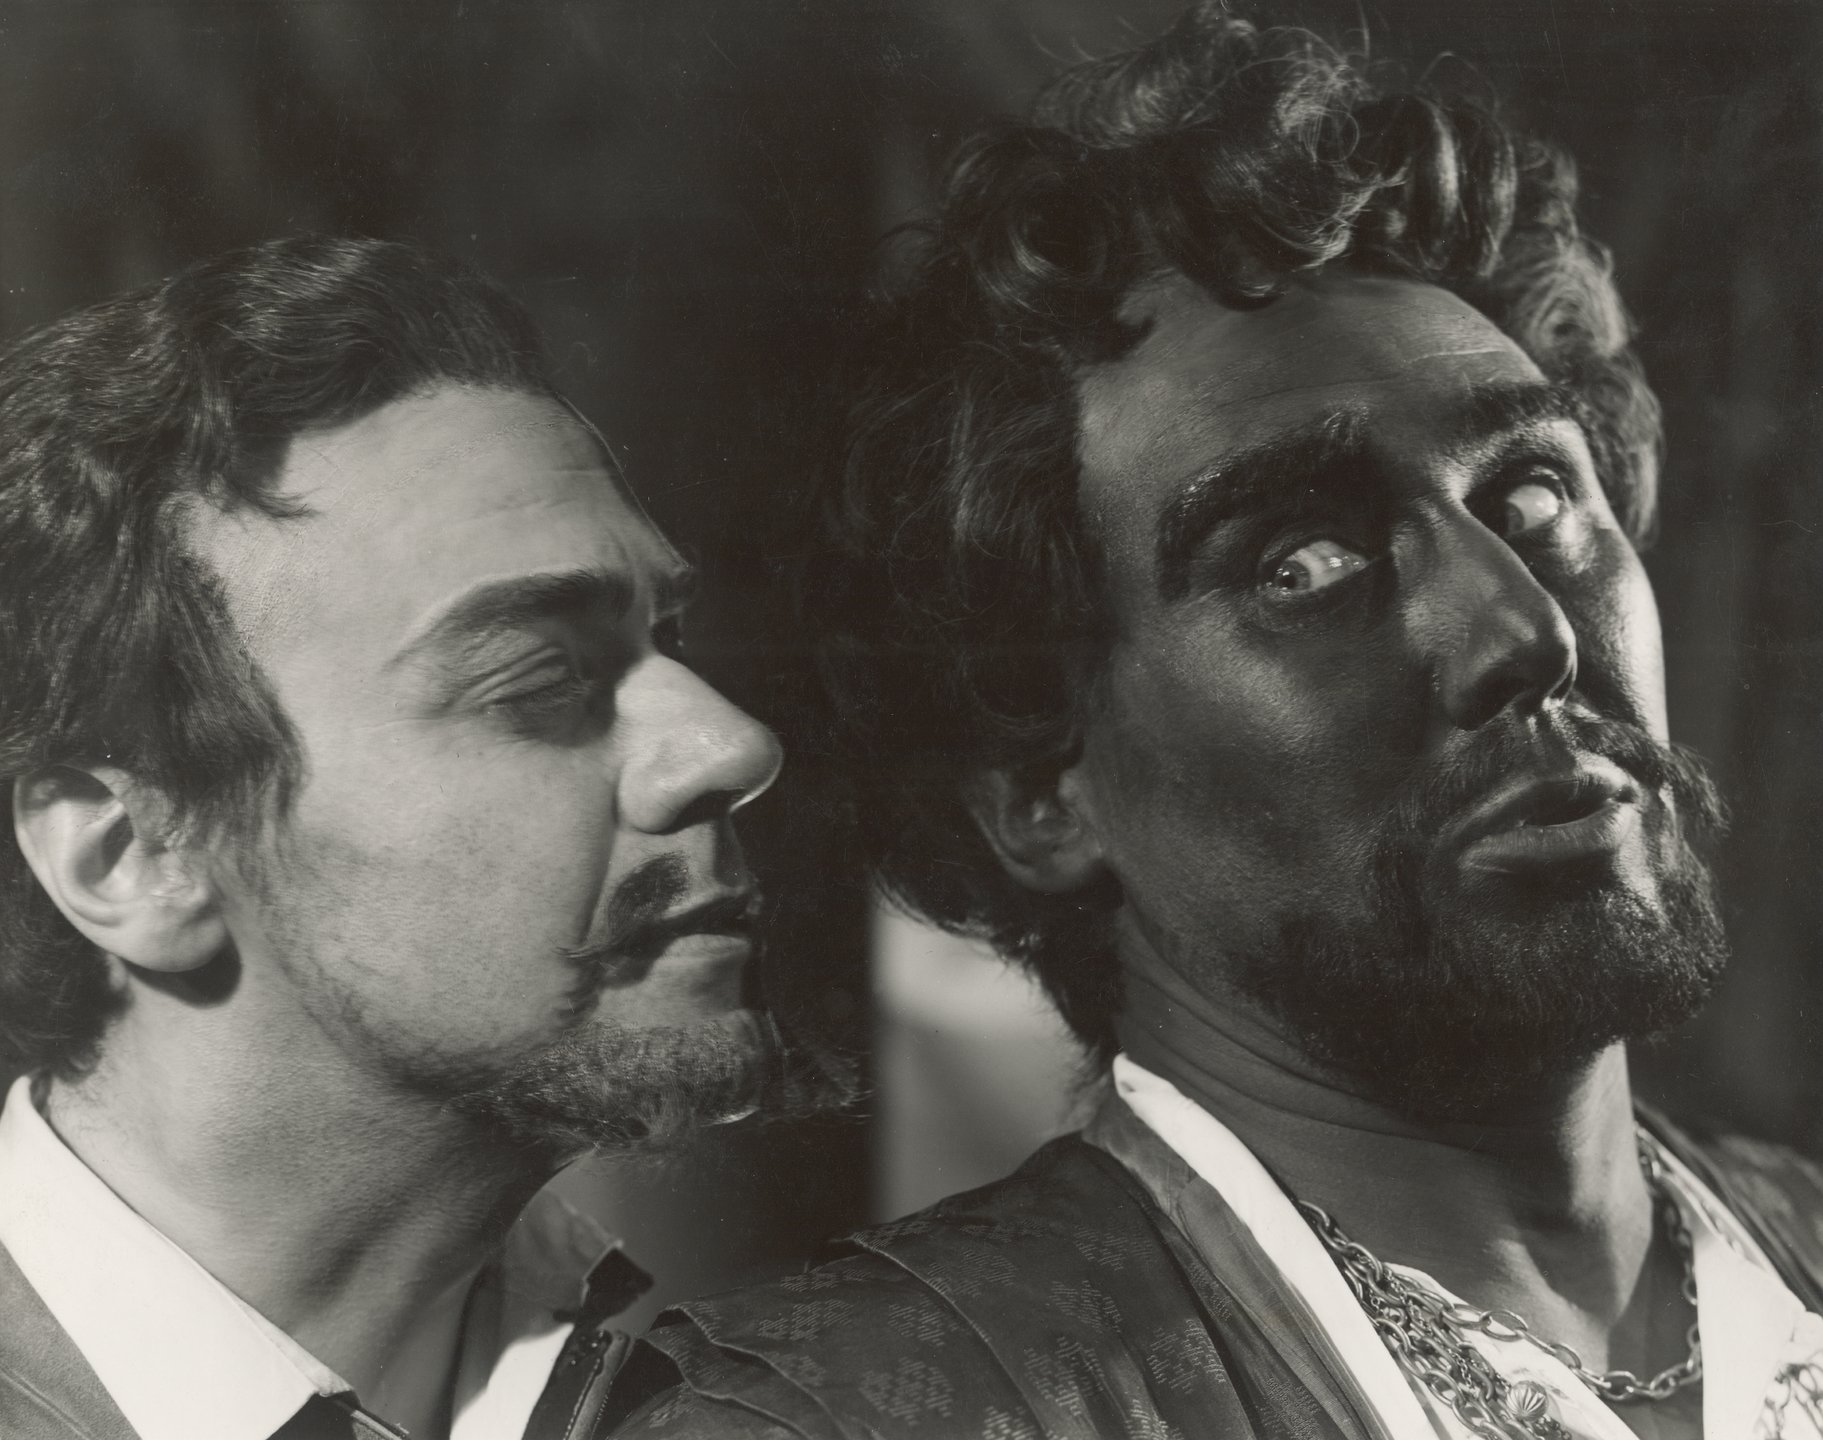 Iago and Othello.